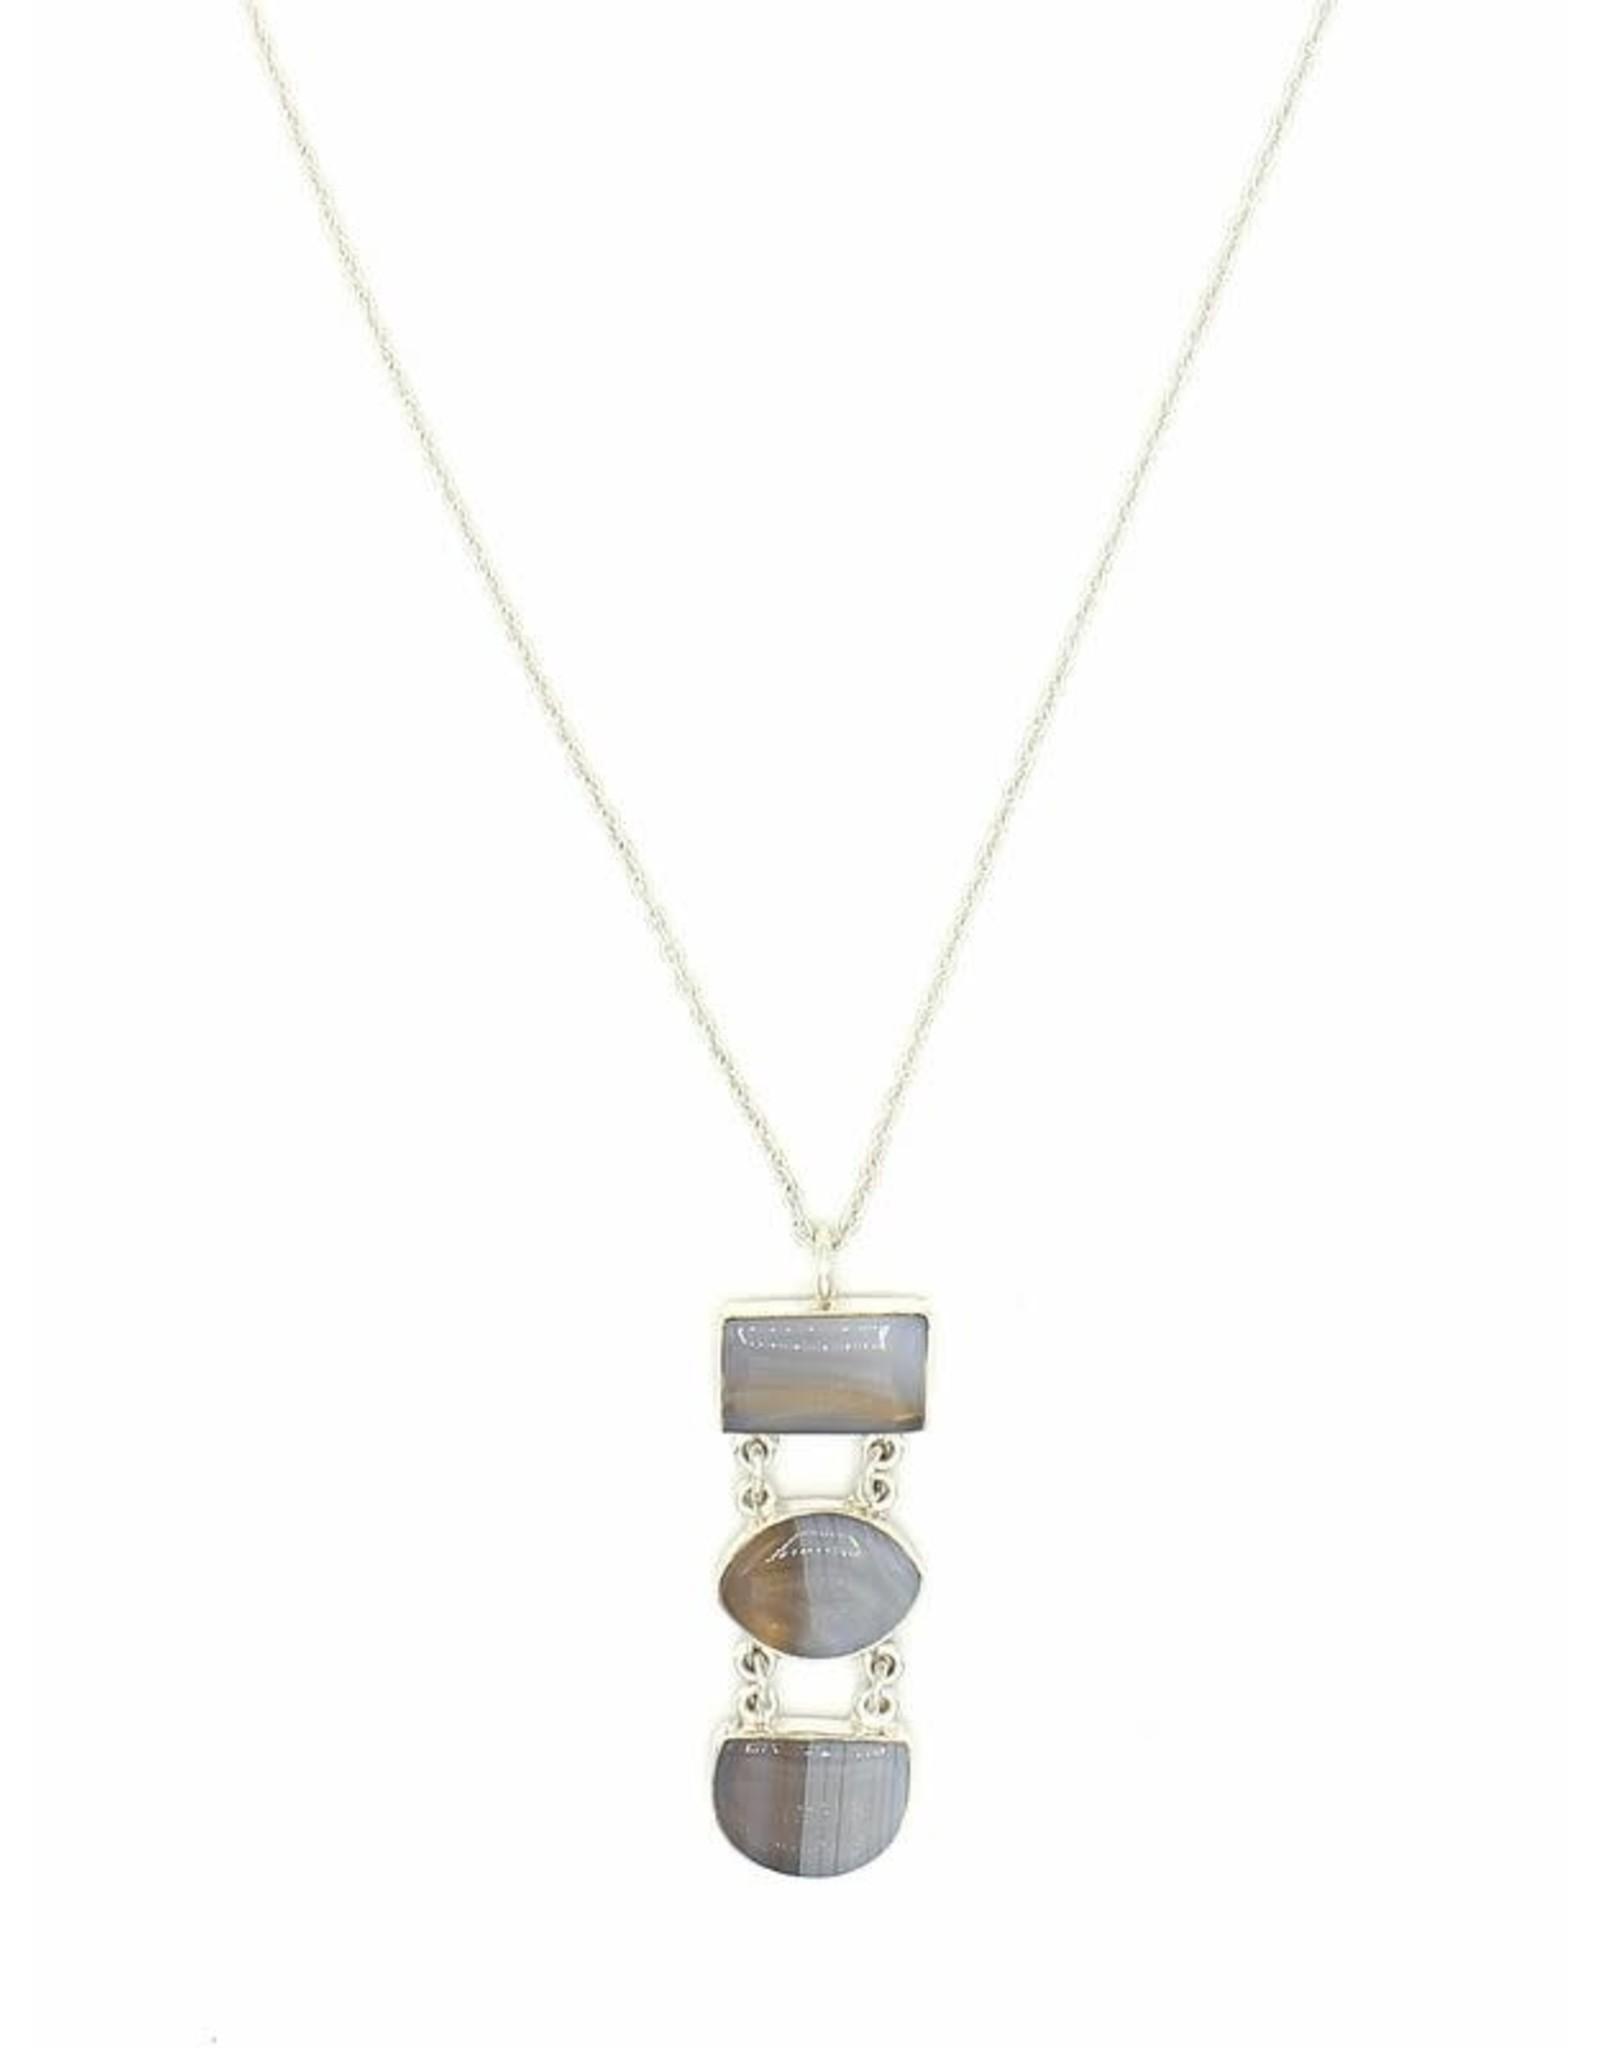 Fair Anita Snowfall Agate Pendant Necklace, India